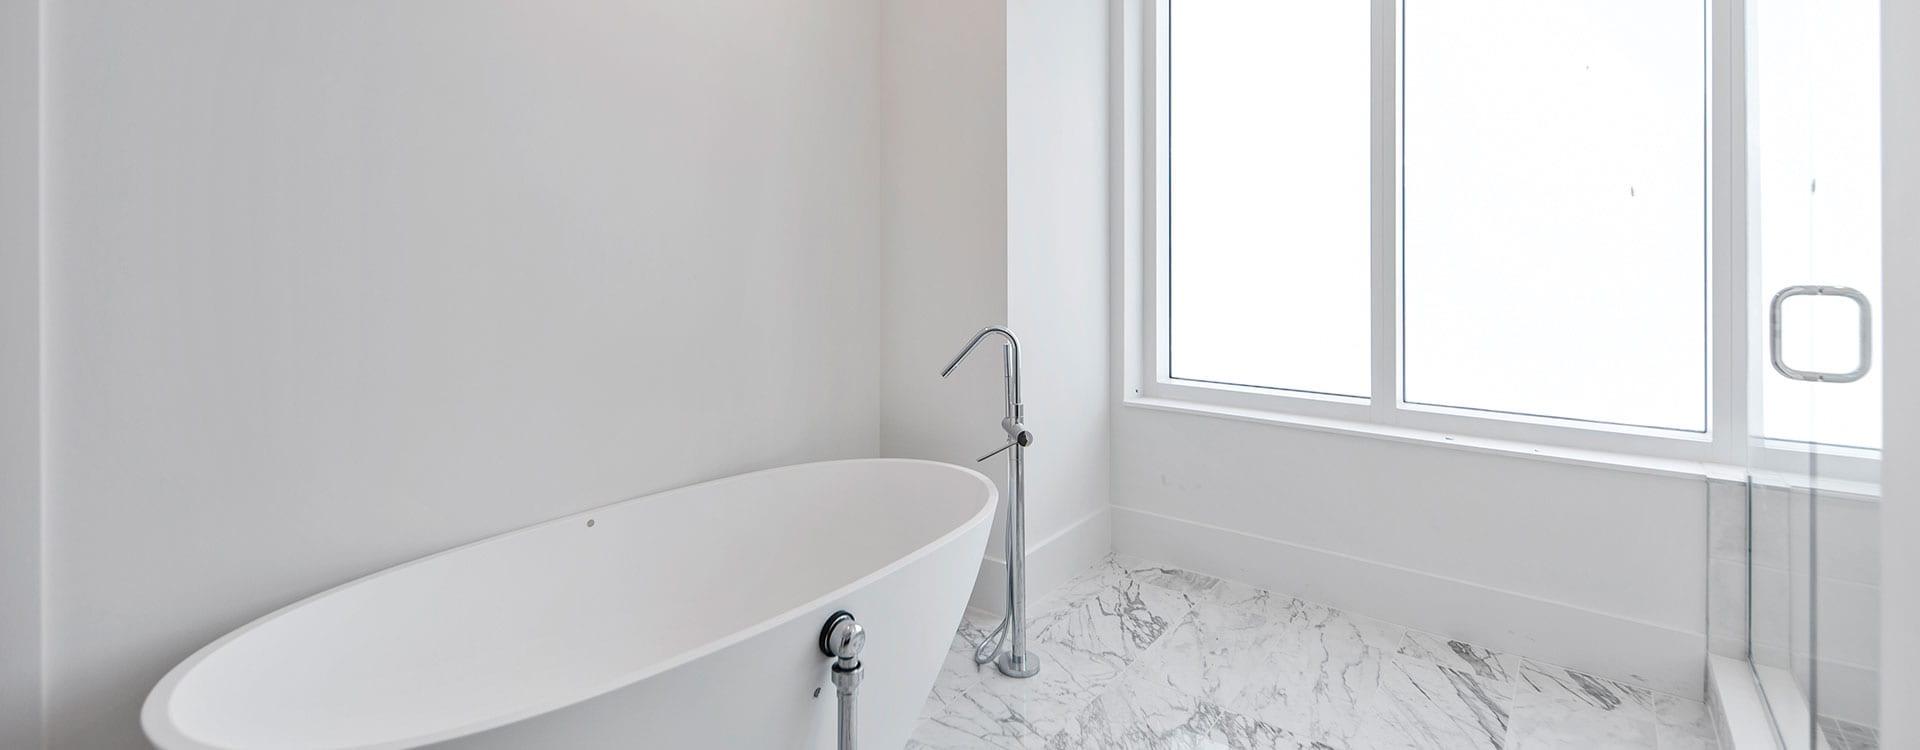 BLVD Residence 903 Bedroom bath